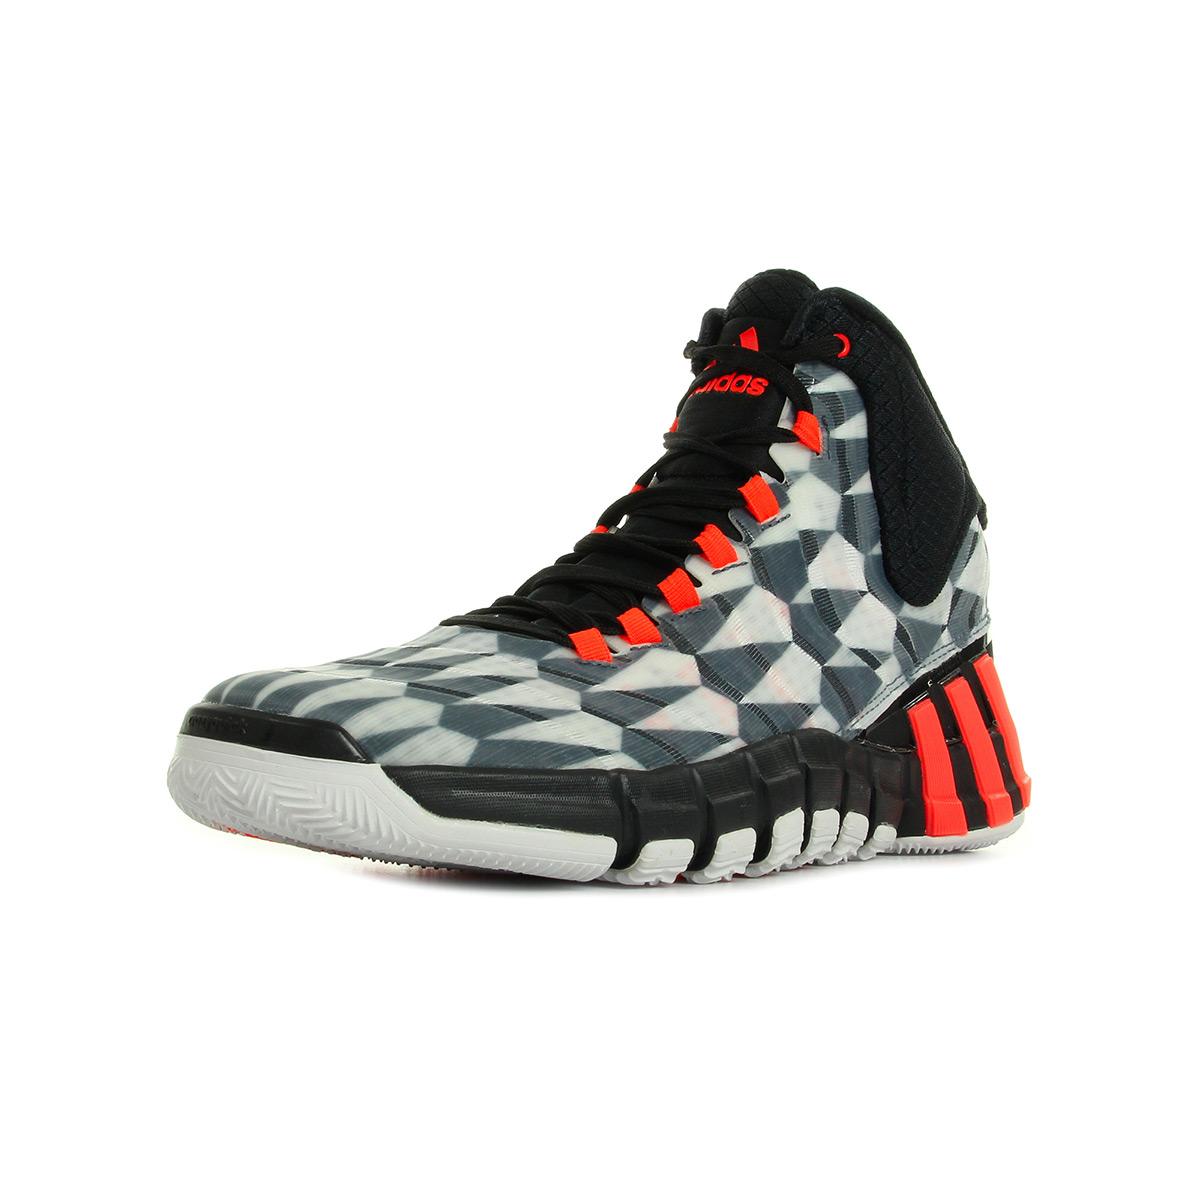 Adidas crazyquick 2